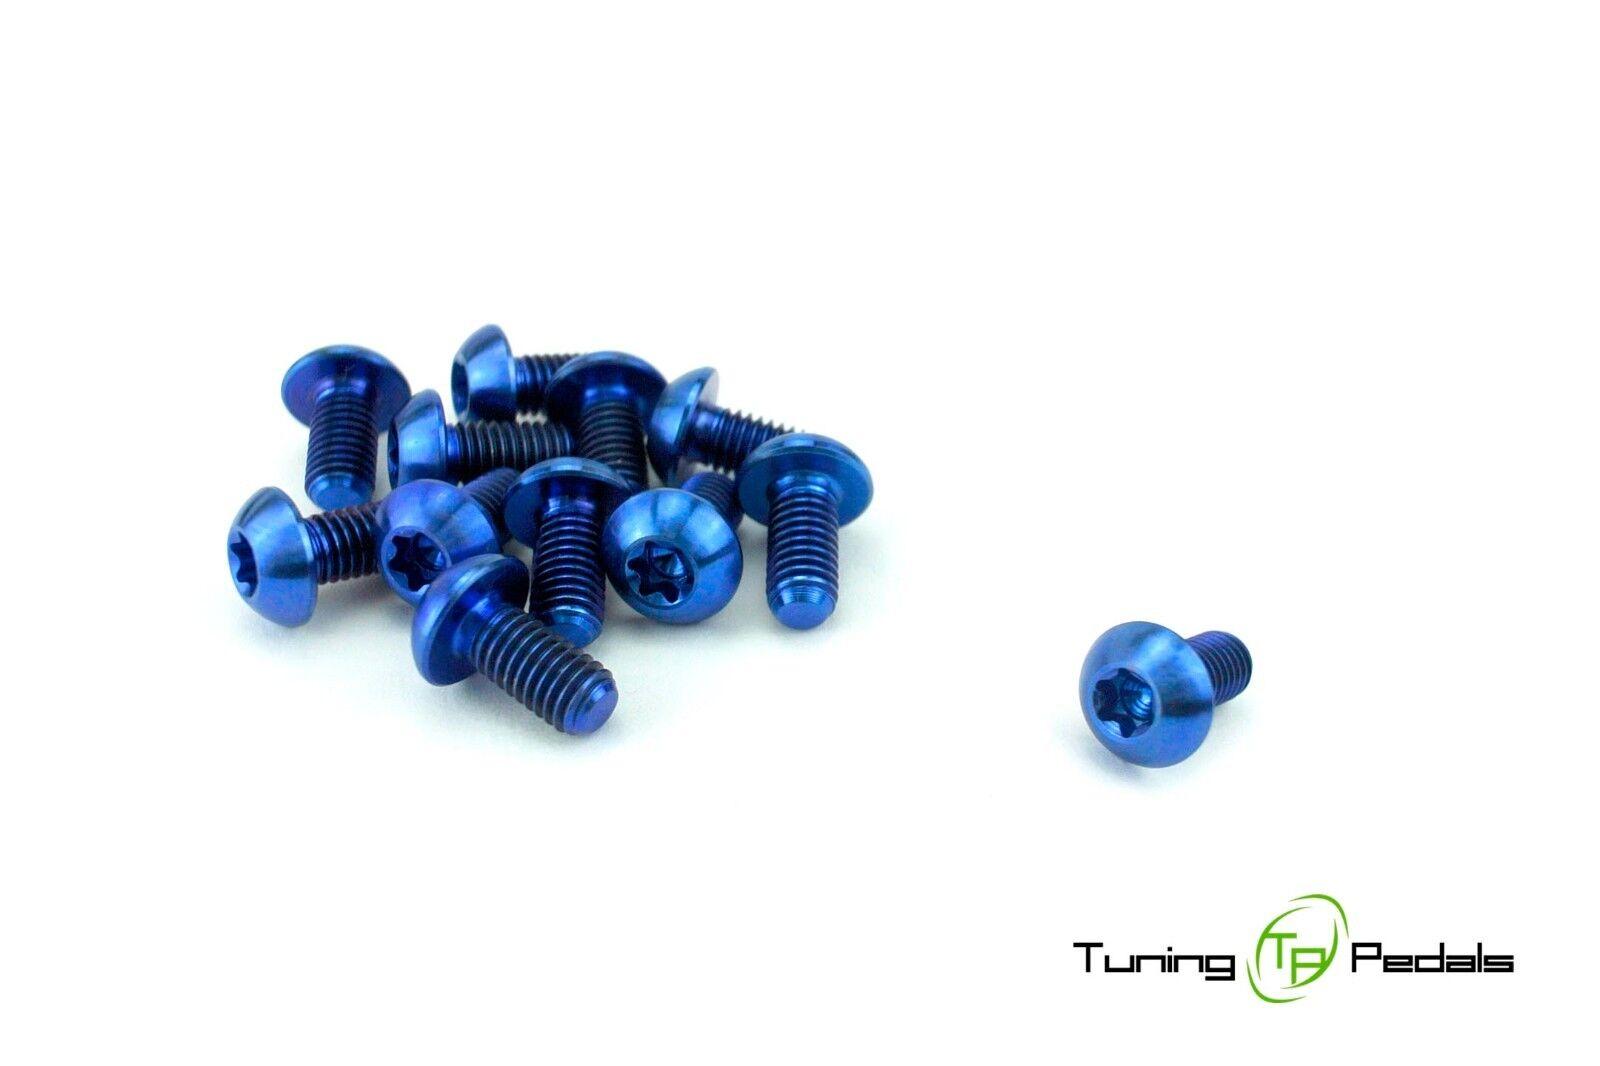 12 Brake Discs Set Titanium Screw M5 x 0 3 8in, blueeeeeeee